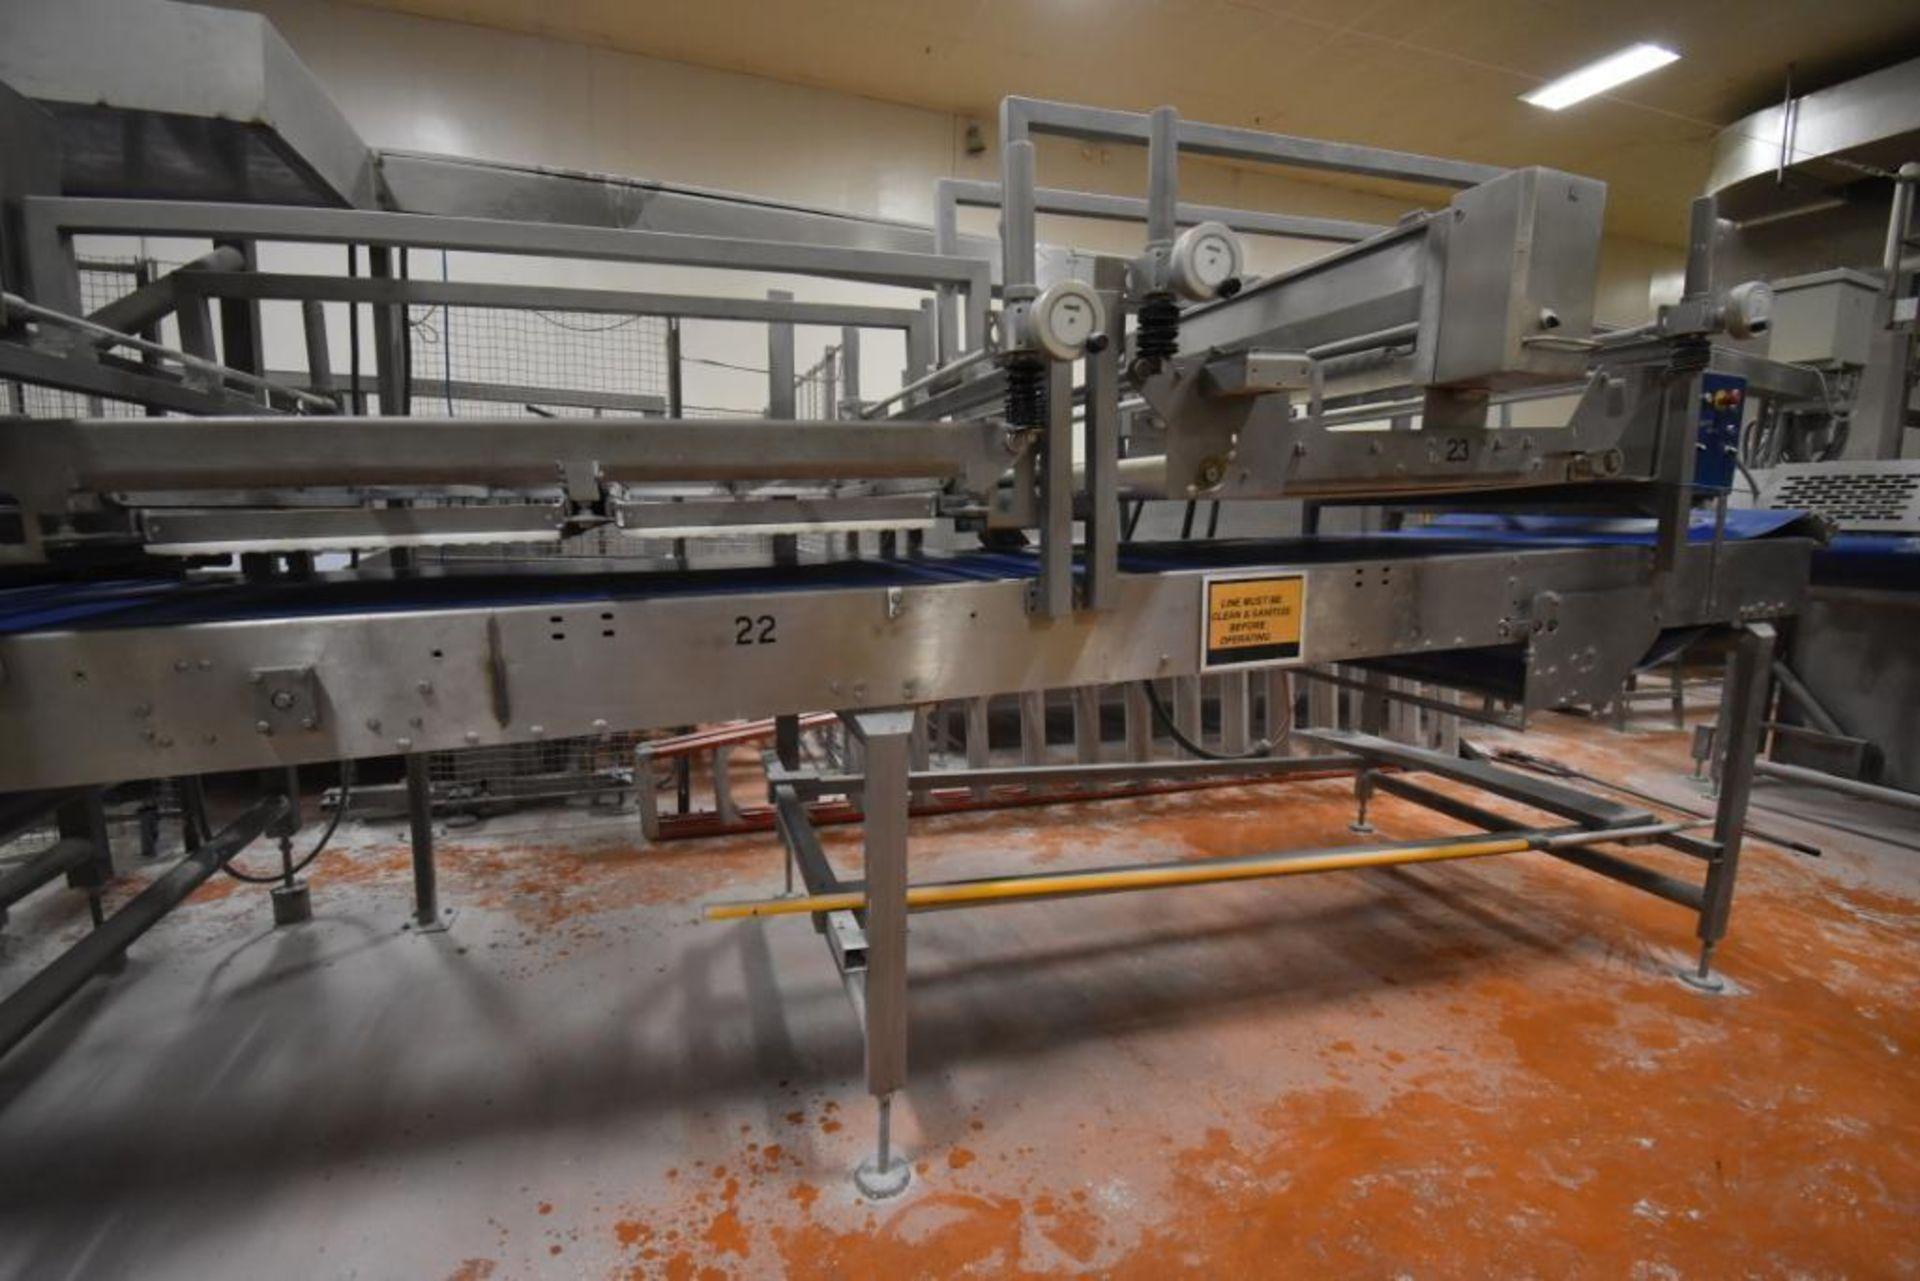 2007 Fritsch Laminator 3000 dough line - Image 198 of 280